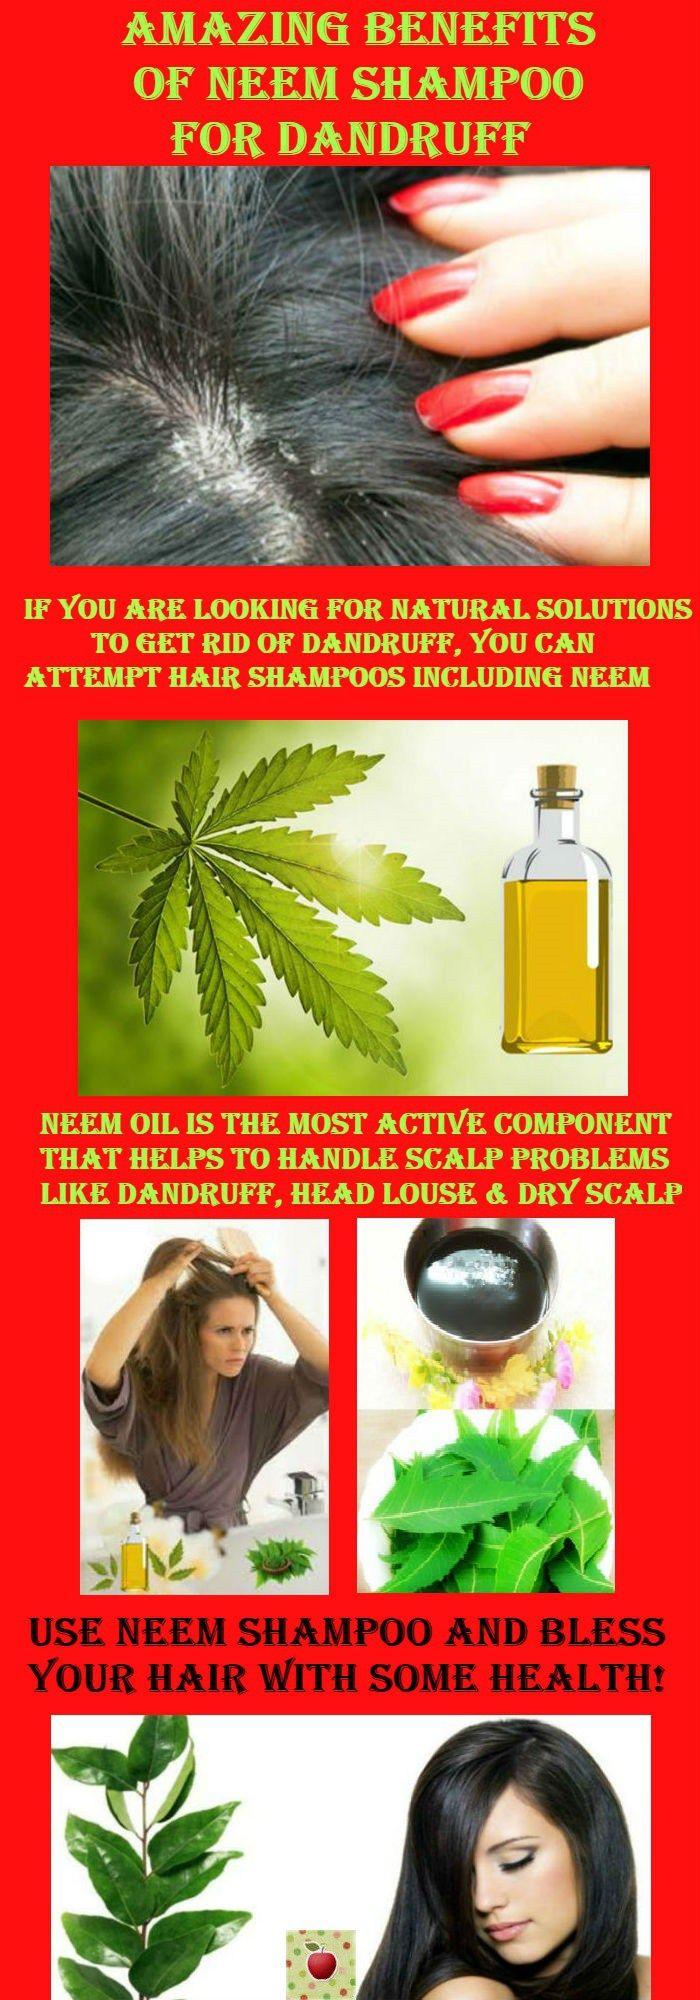 Amazing Benefits Of Neem Shampoo For Dandruff